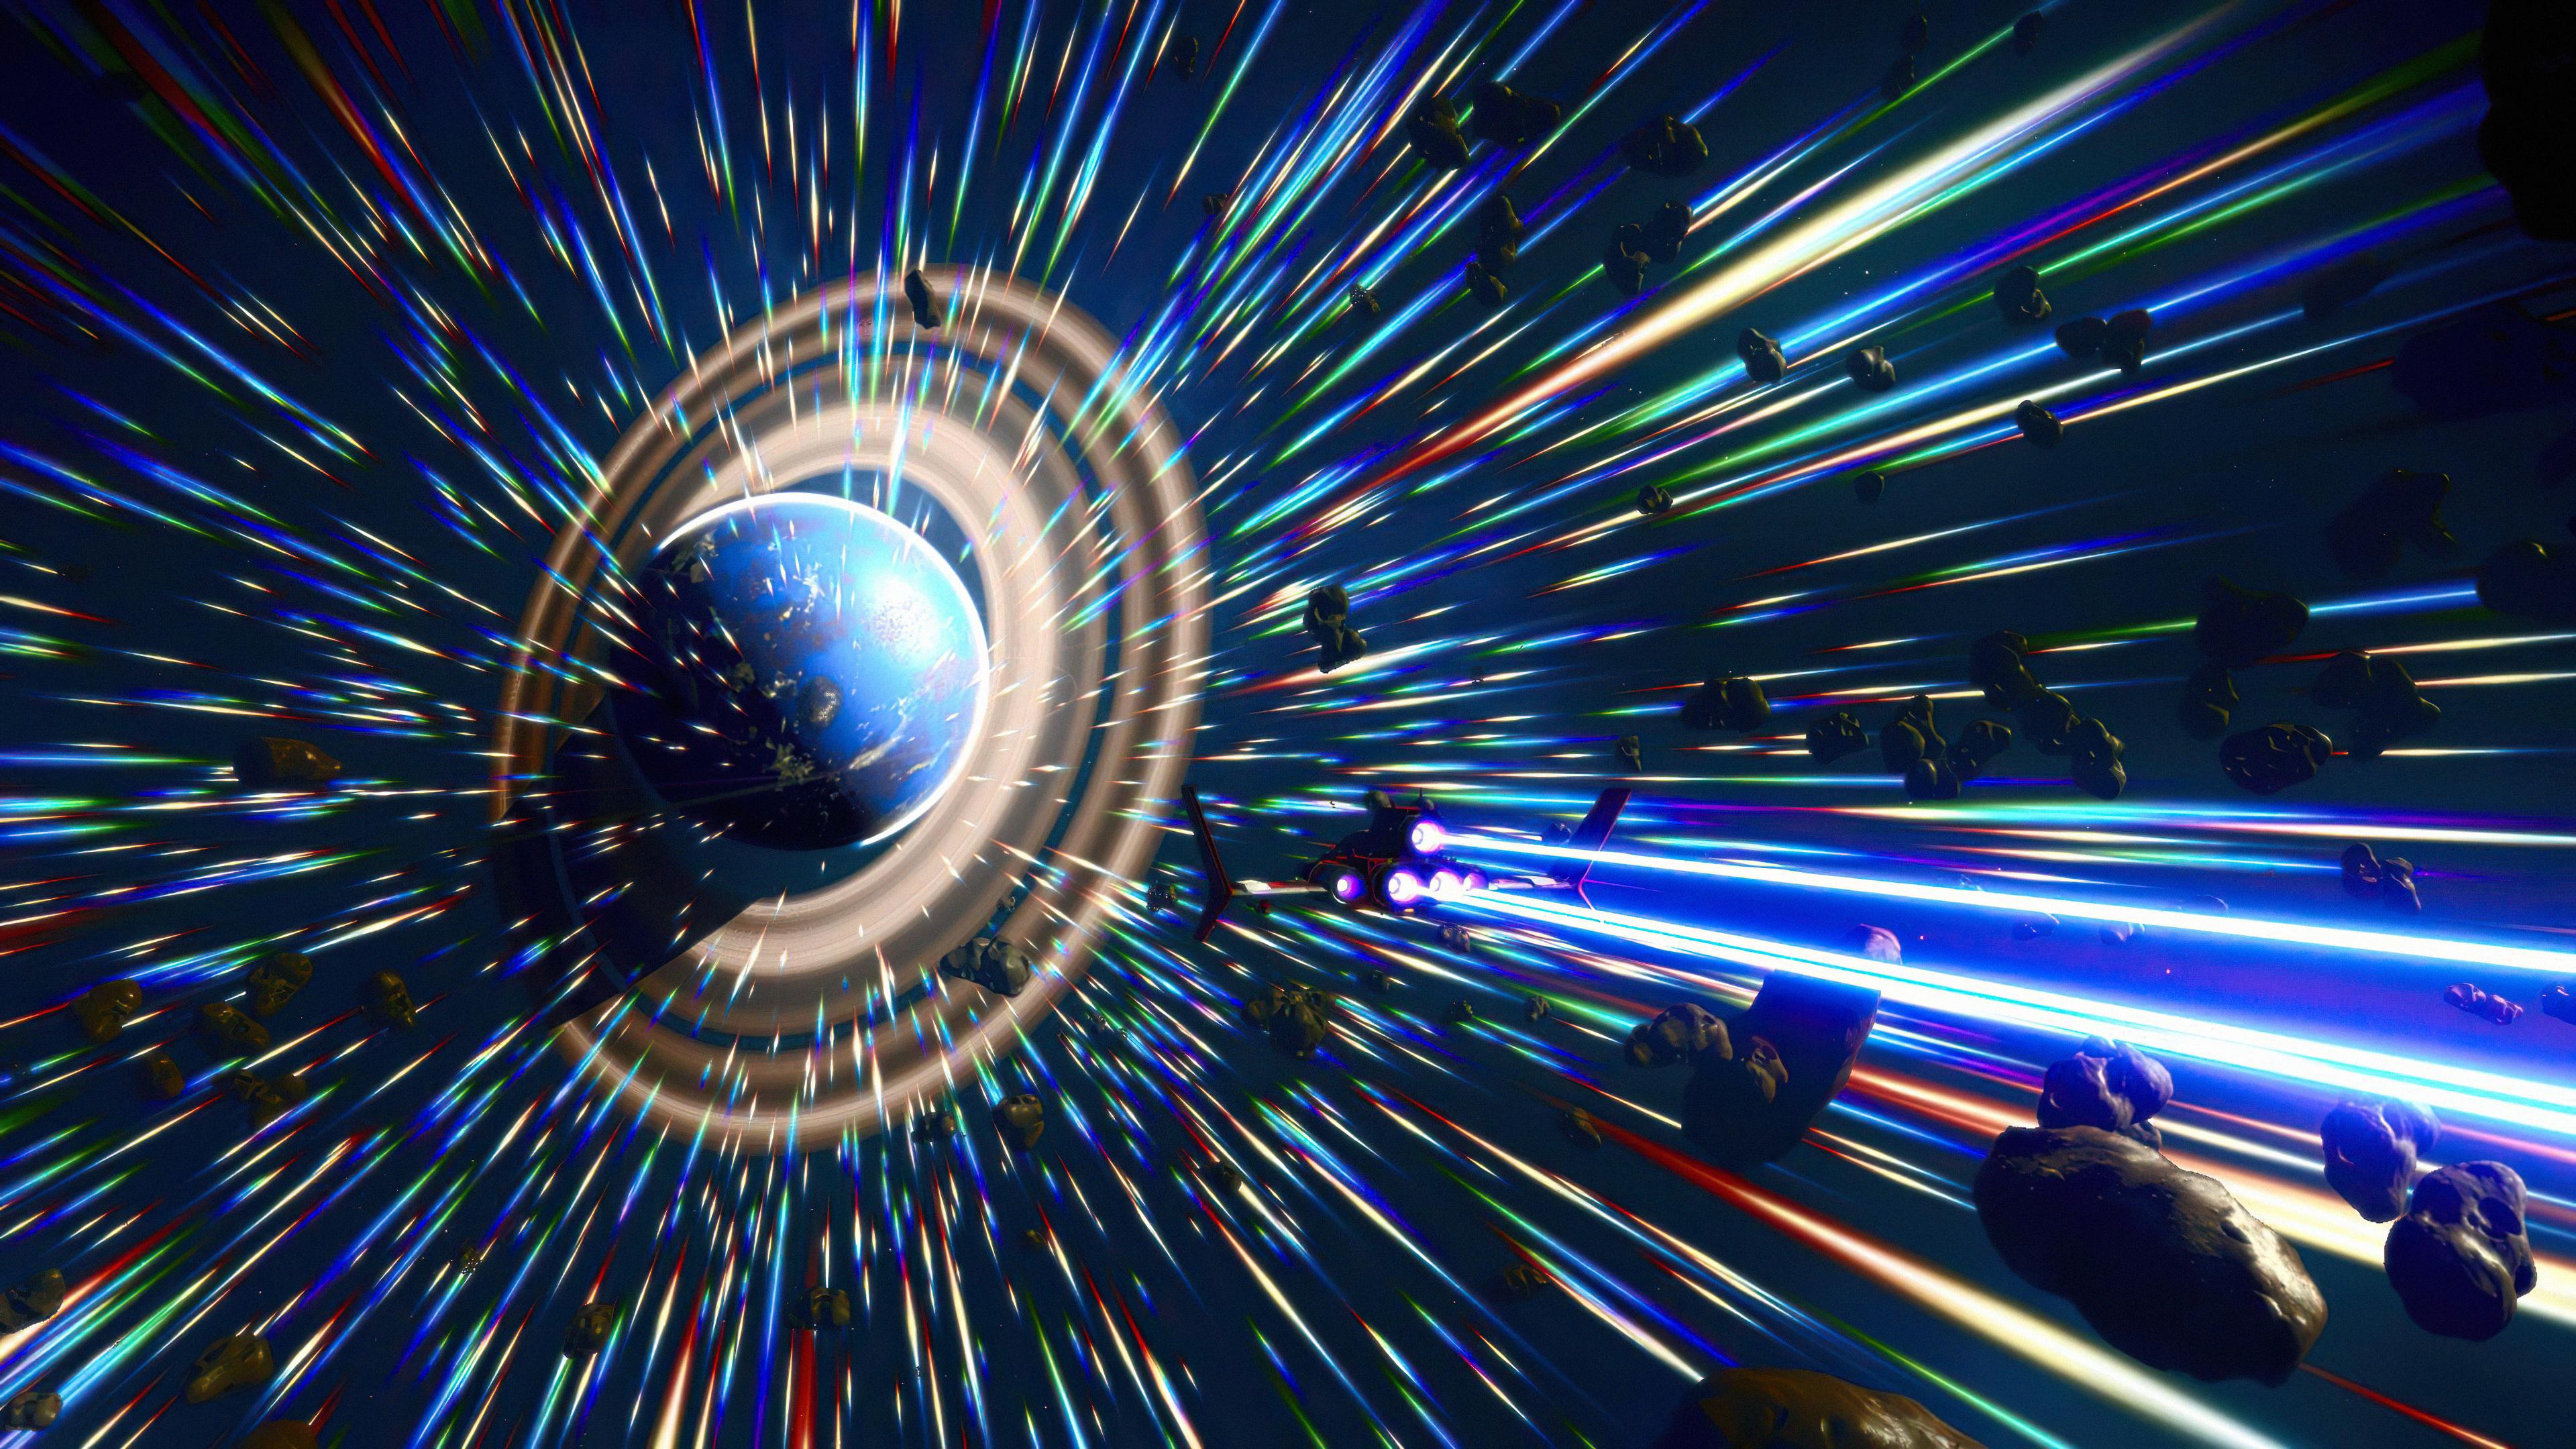 Fondos de pantalla Explorando planetas